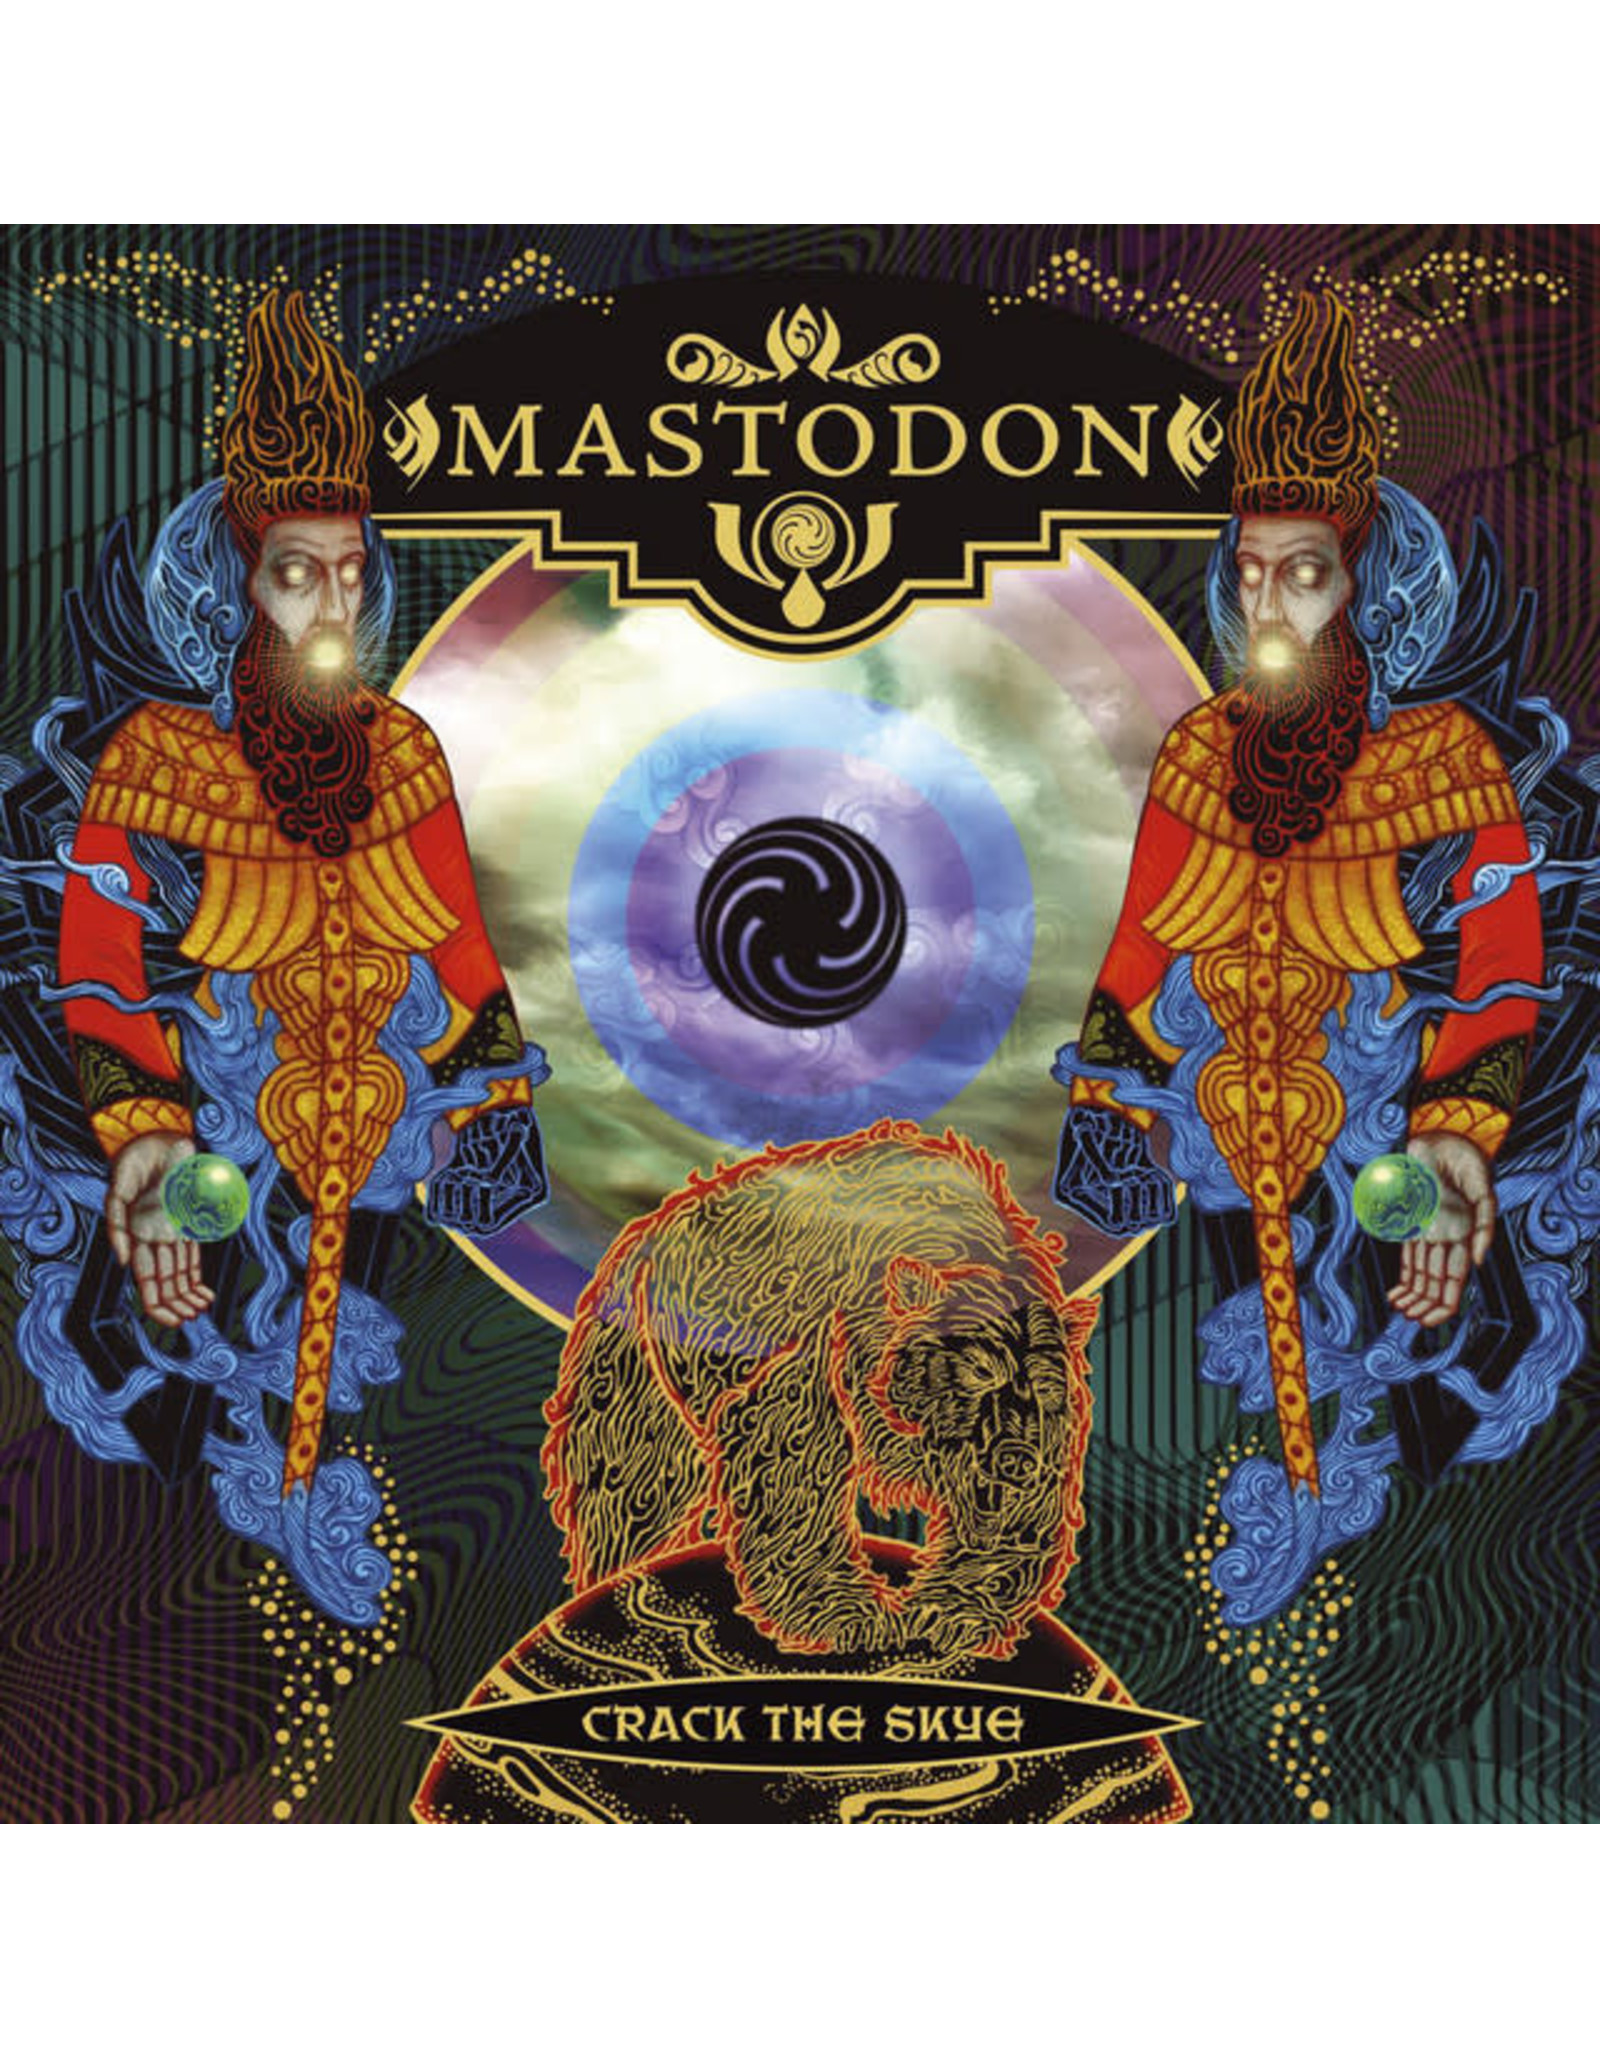 Vinyl Mastodon - Crack The Skye